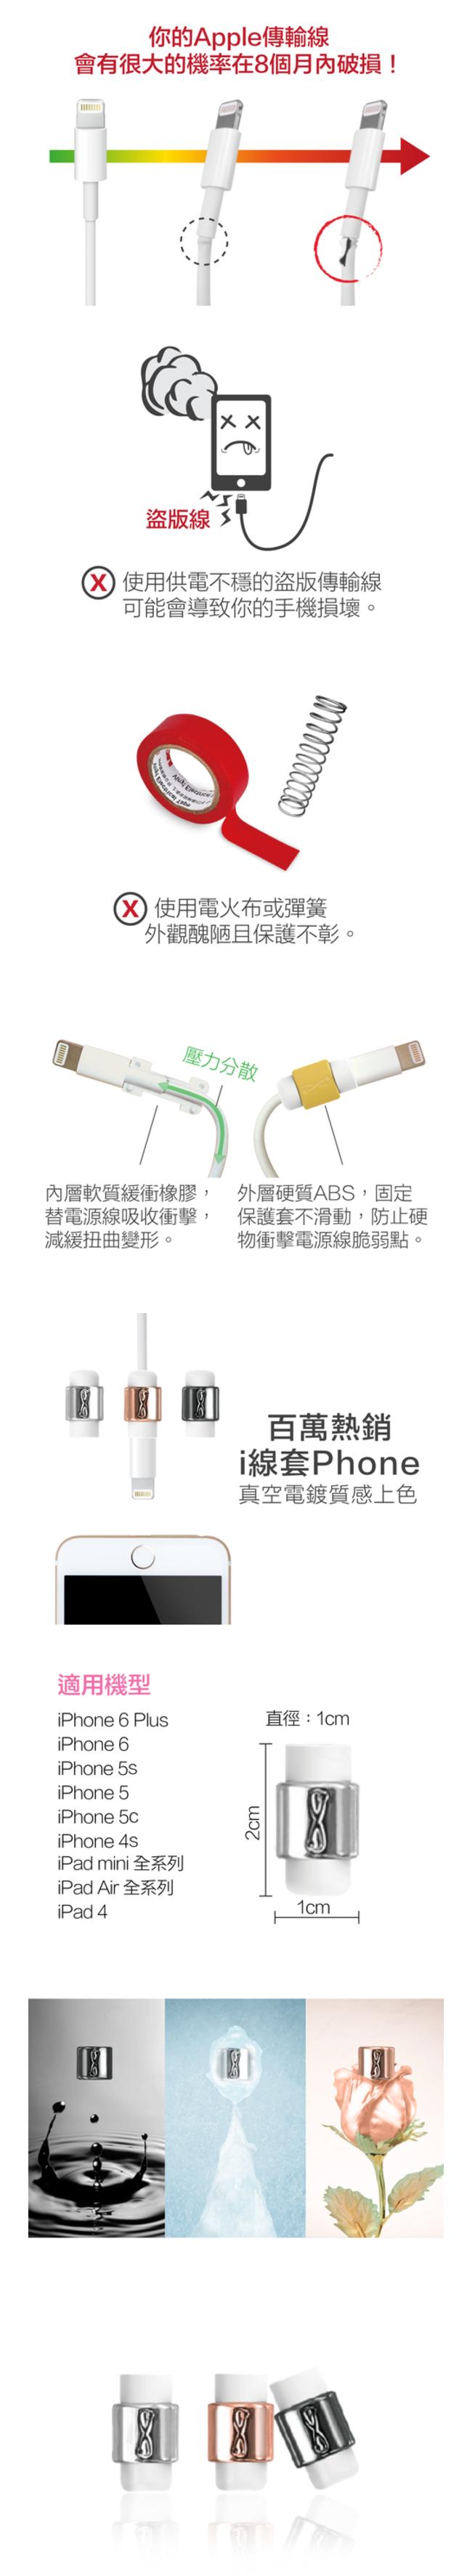 FireShot Capture 117 - i線套Phone炫色版 - http___limitstyle.com_stores_11#shop-31